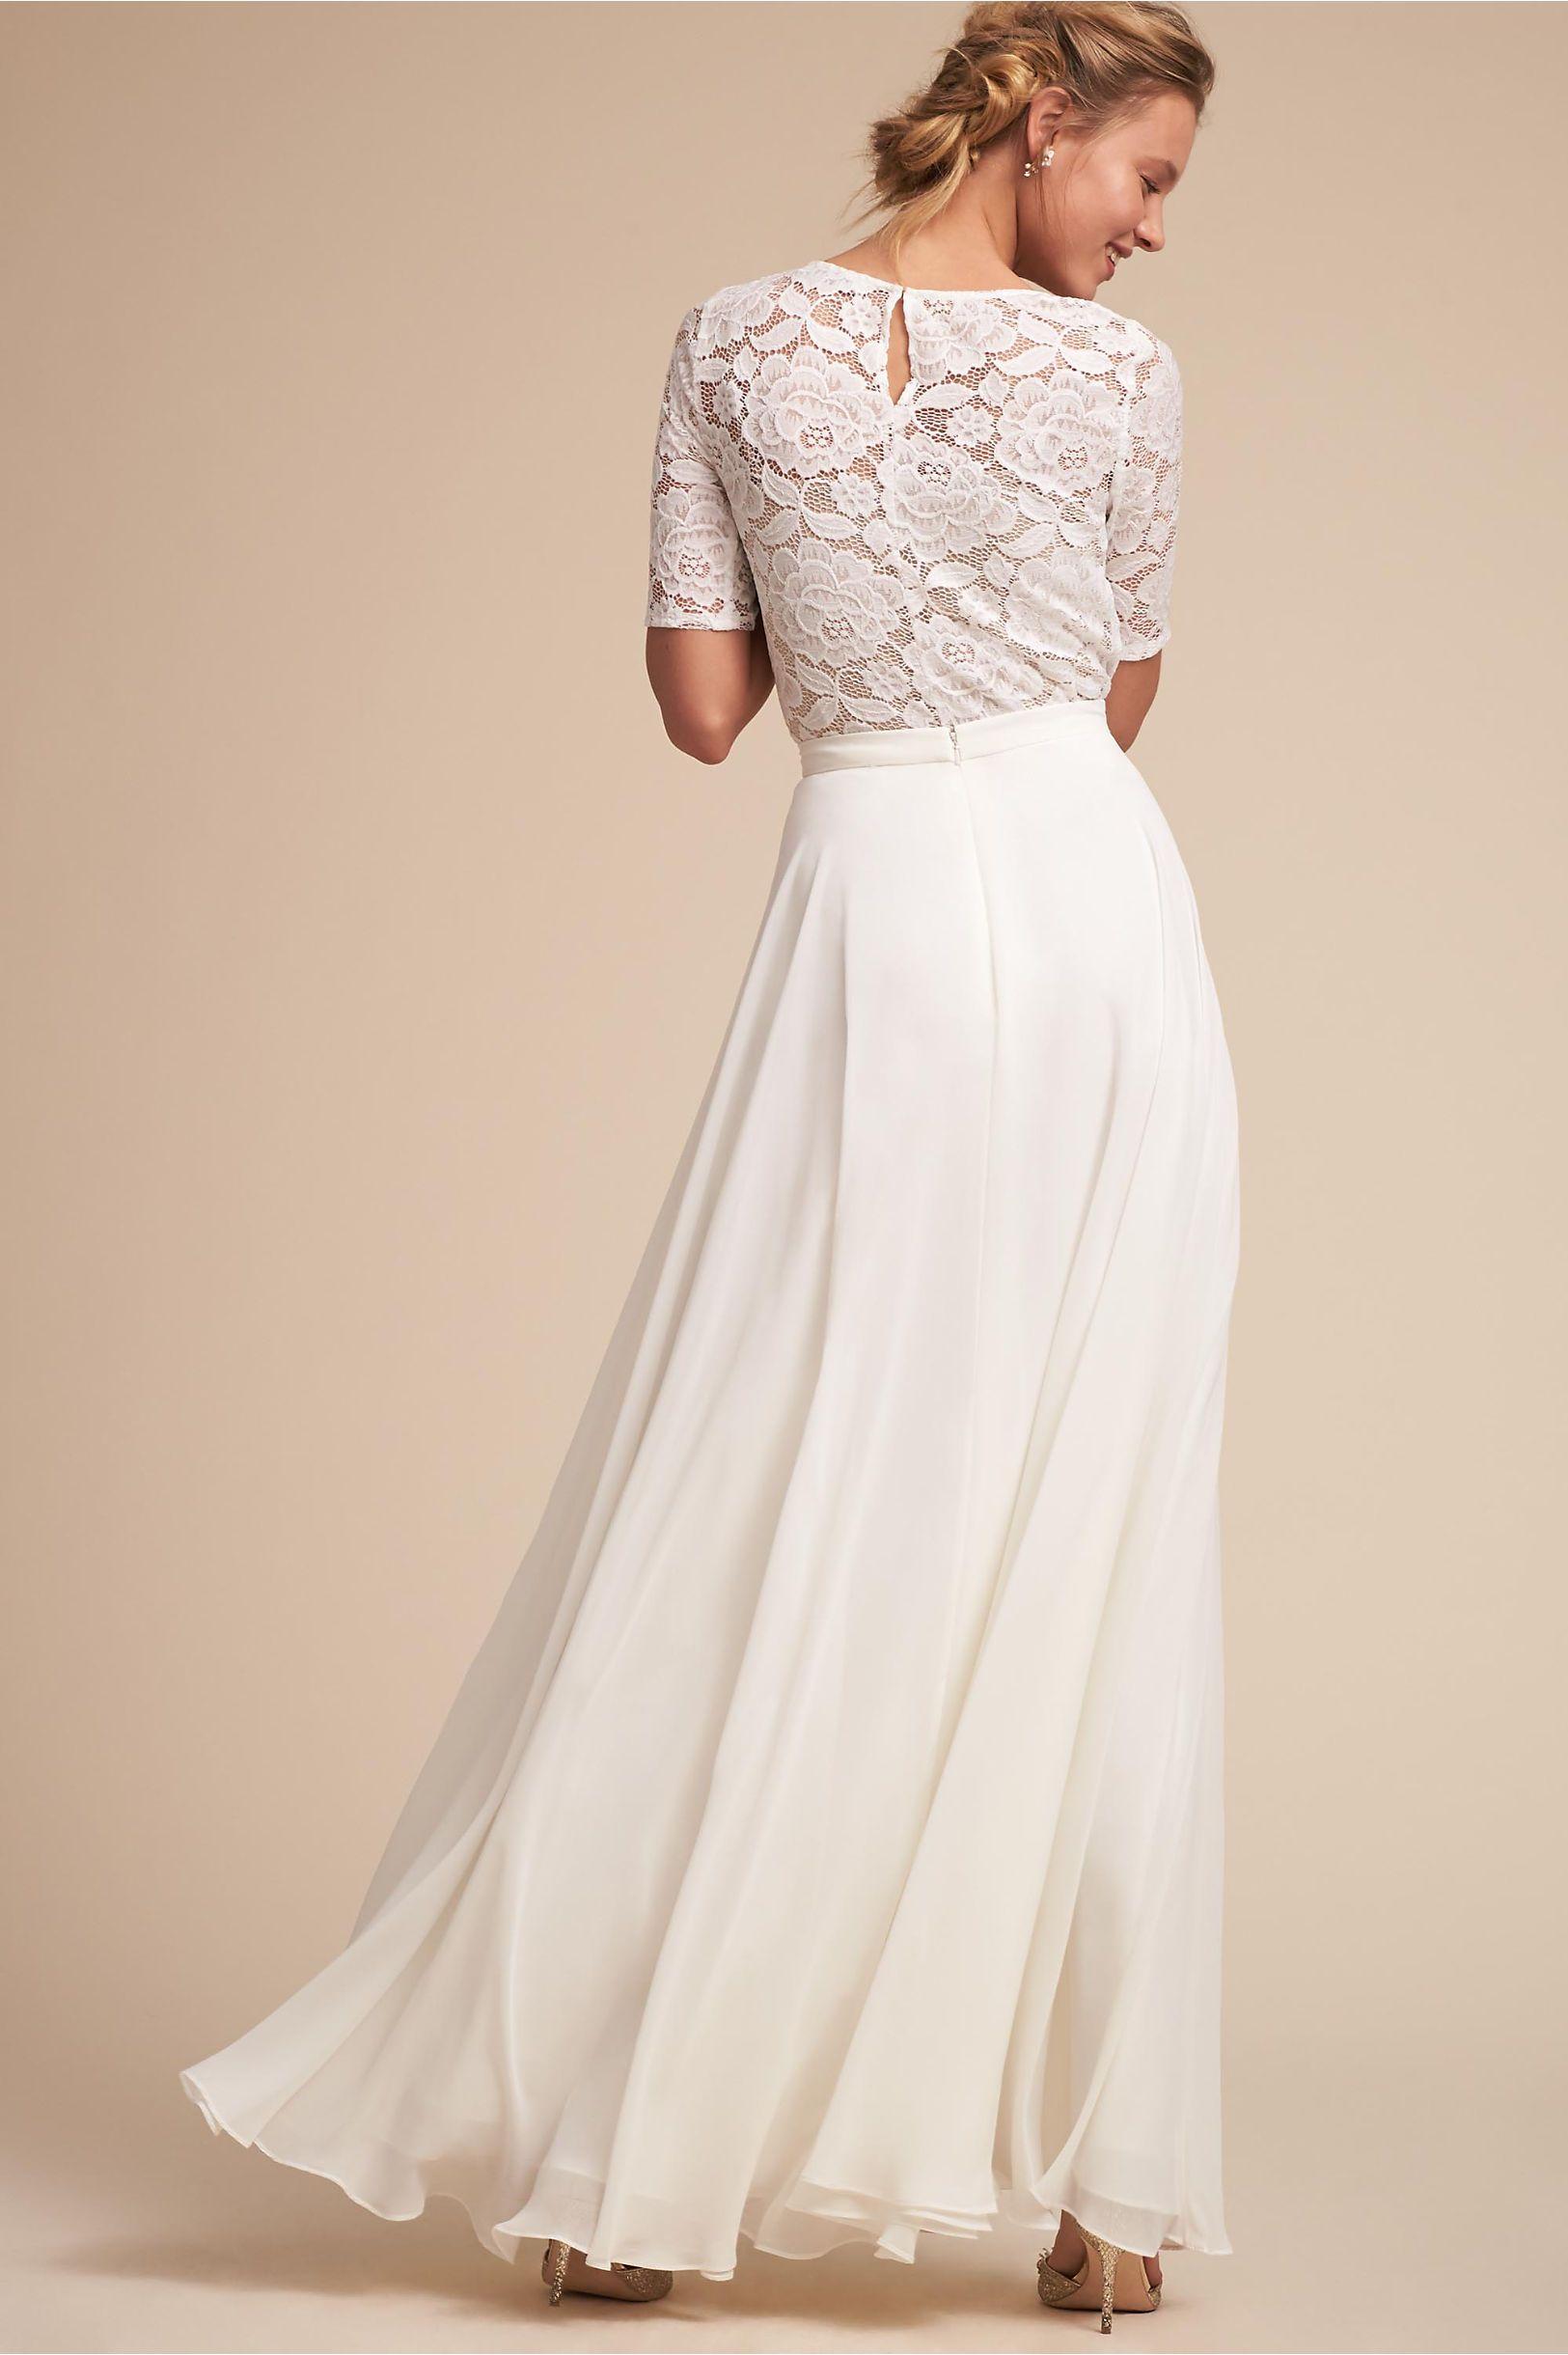 Dresses to wear to a destination wedding as a guest  jivehamptonwhiteb  pixels  Wedding  Pinterest